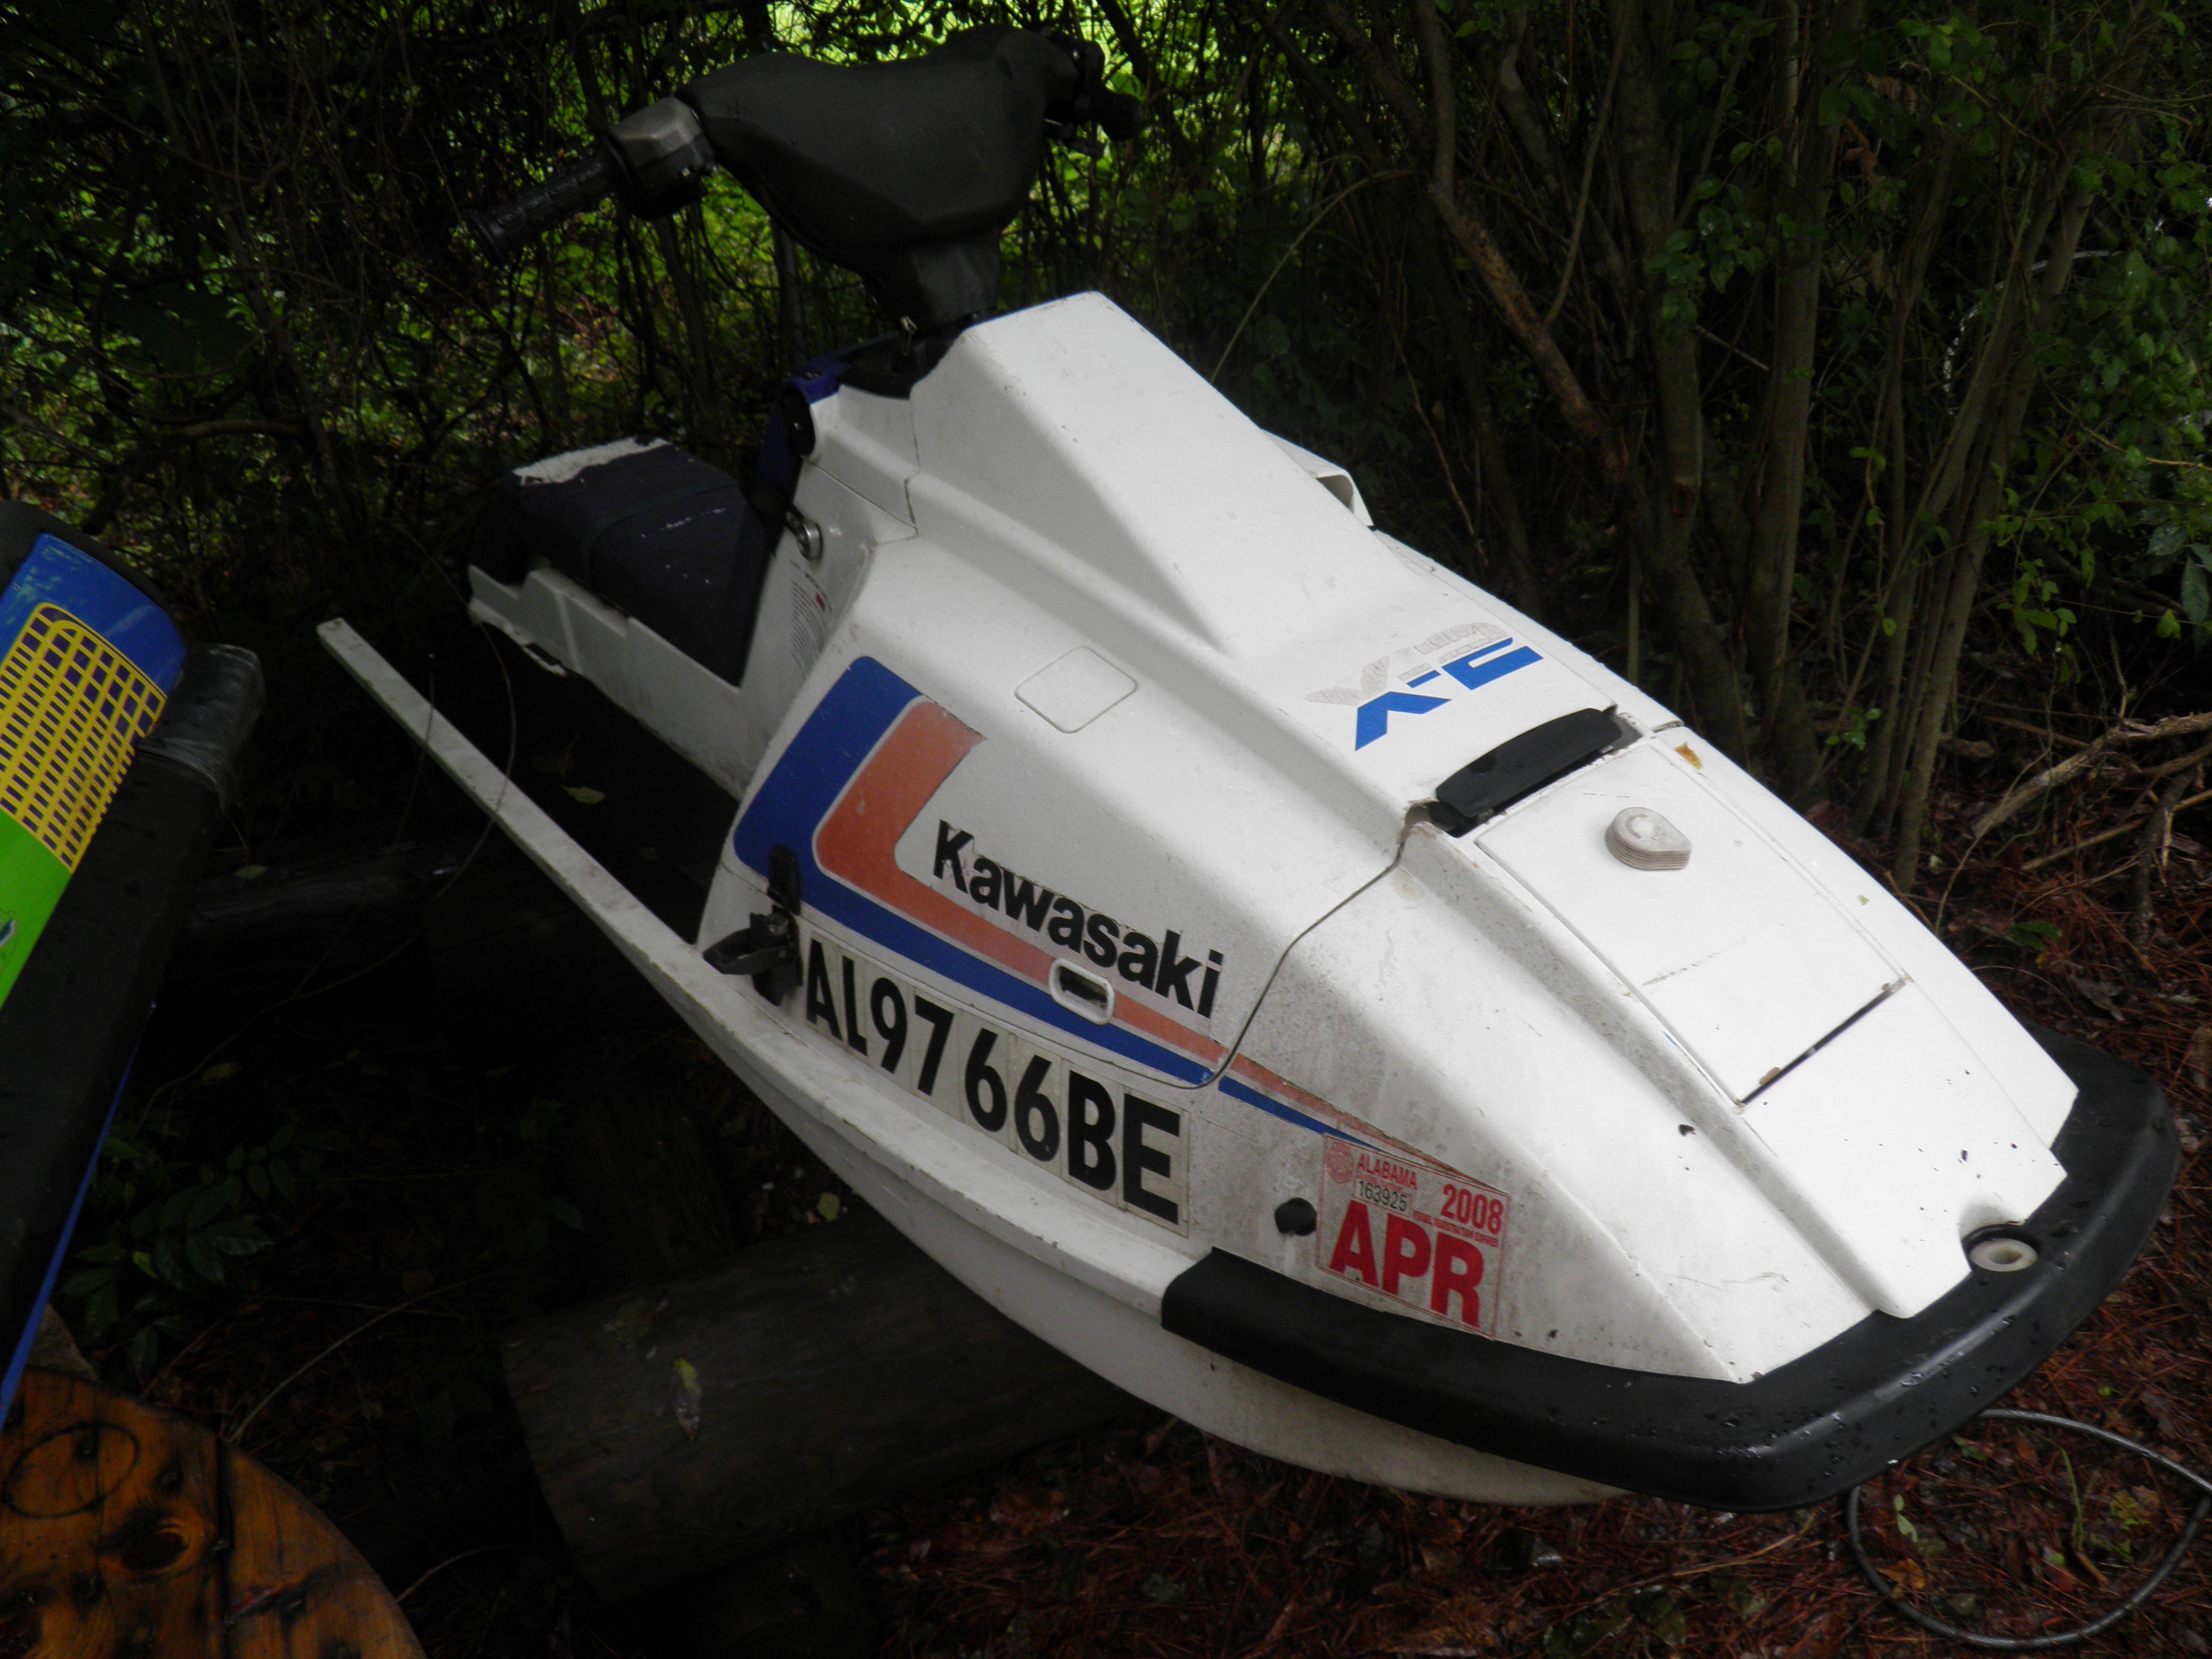 My 89 Kawasaki X2 650 - Going to redo this one!!! | Jet Ski's - No